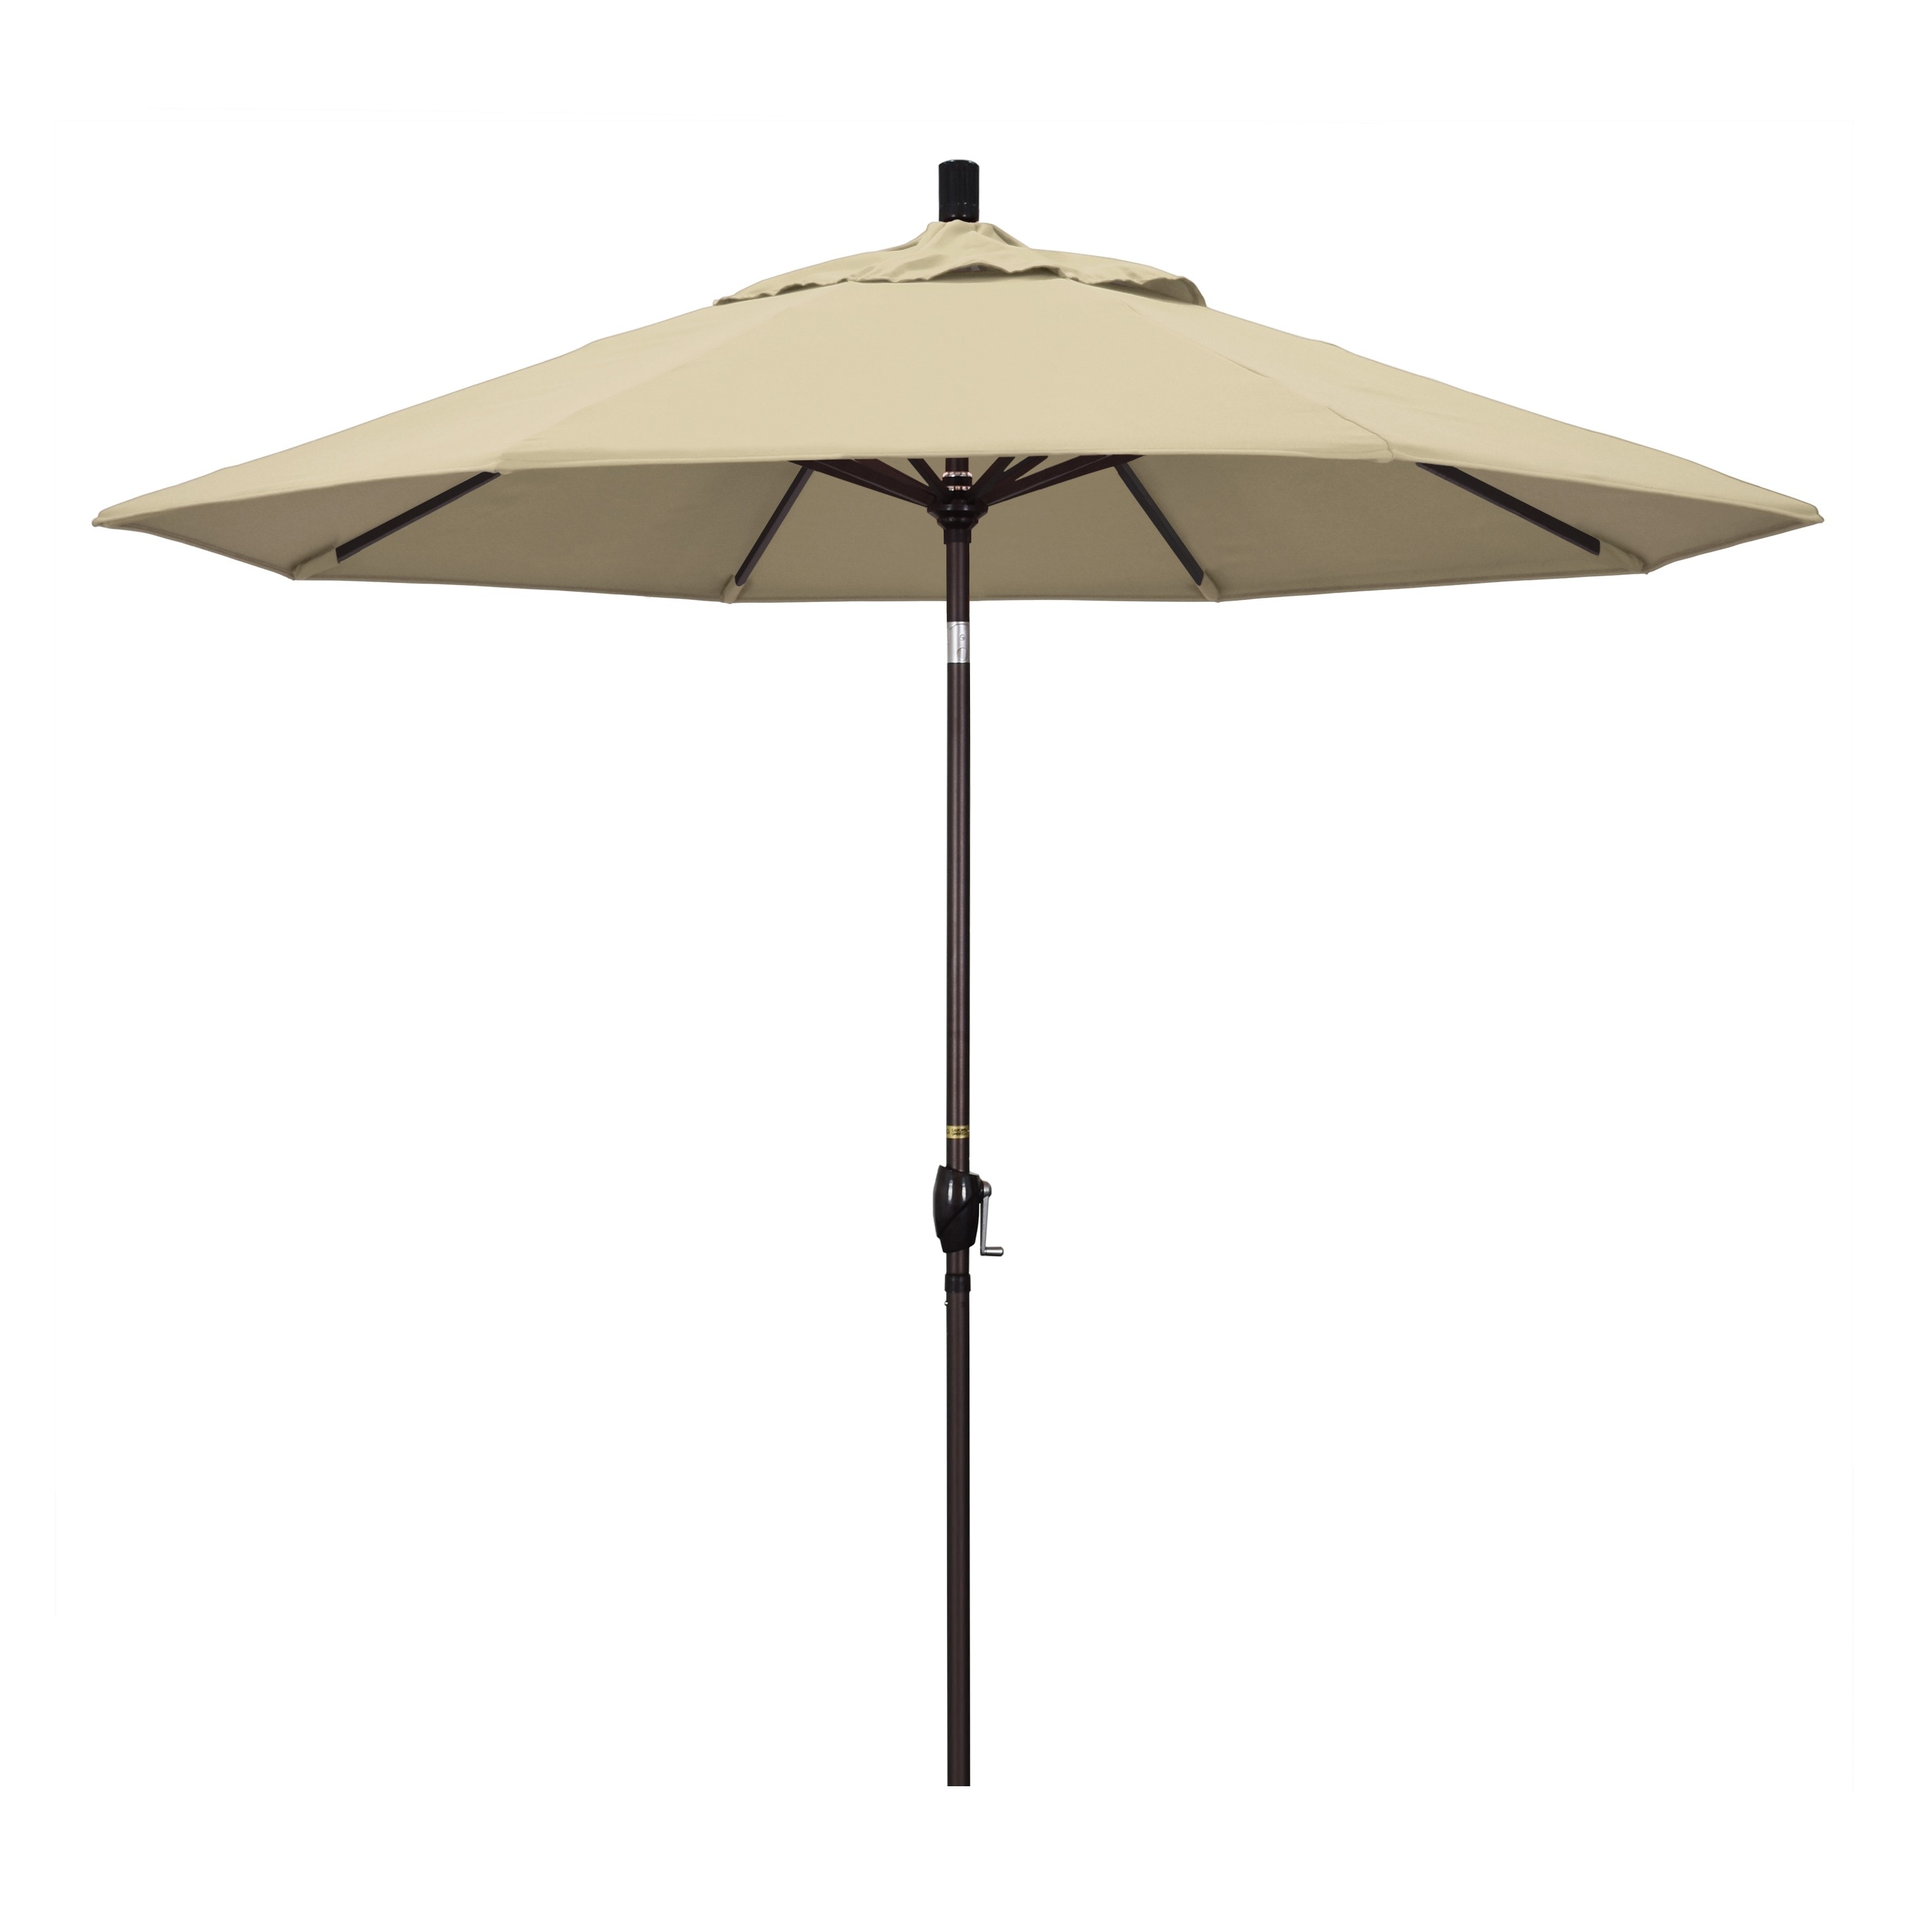 9' Market Style Outdoor Umbrella with Wind Vent Antique Beige